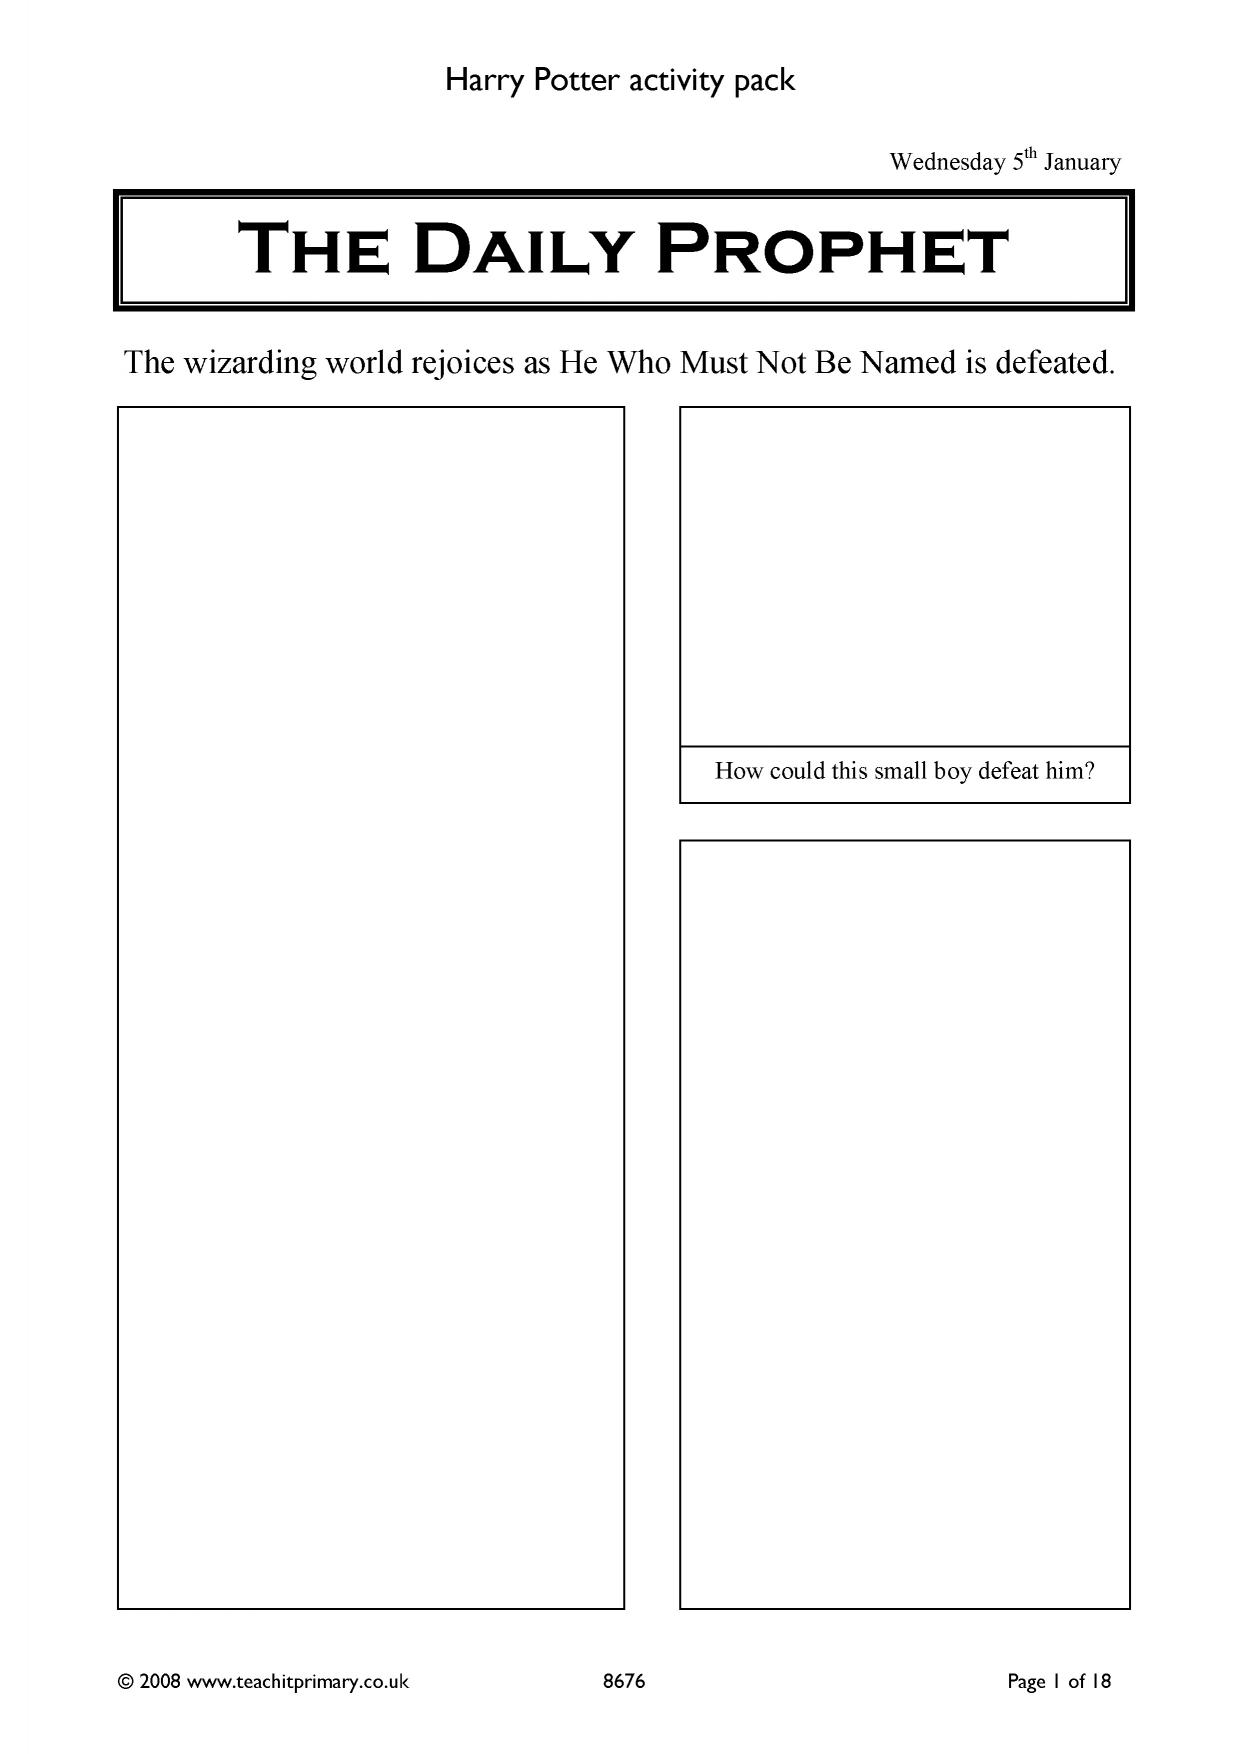 Harry Potter Vocabulary Worksheet